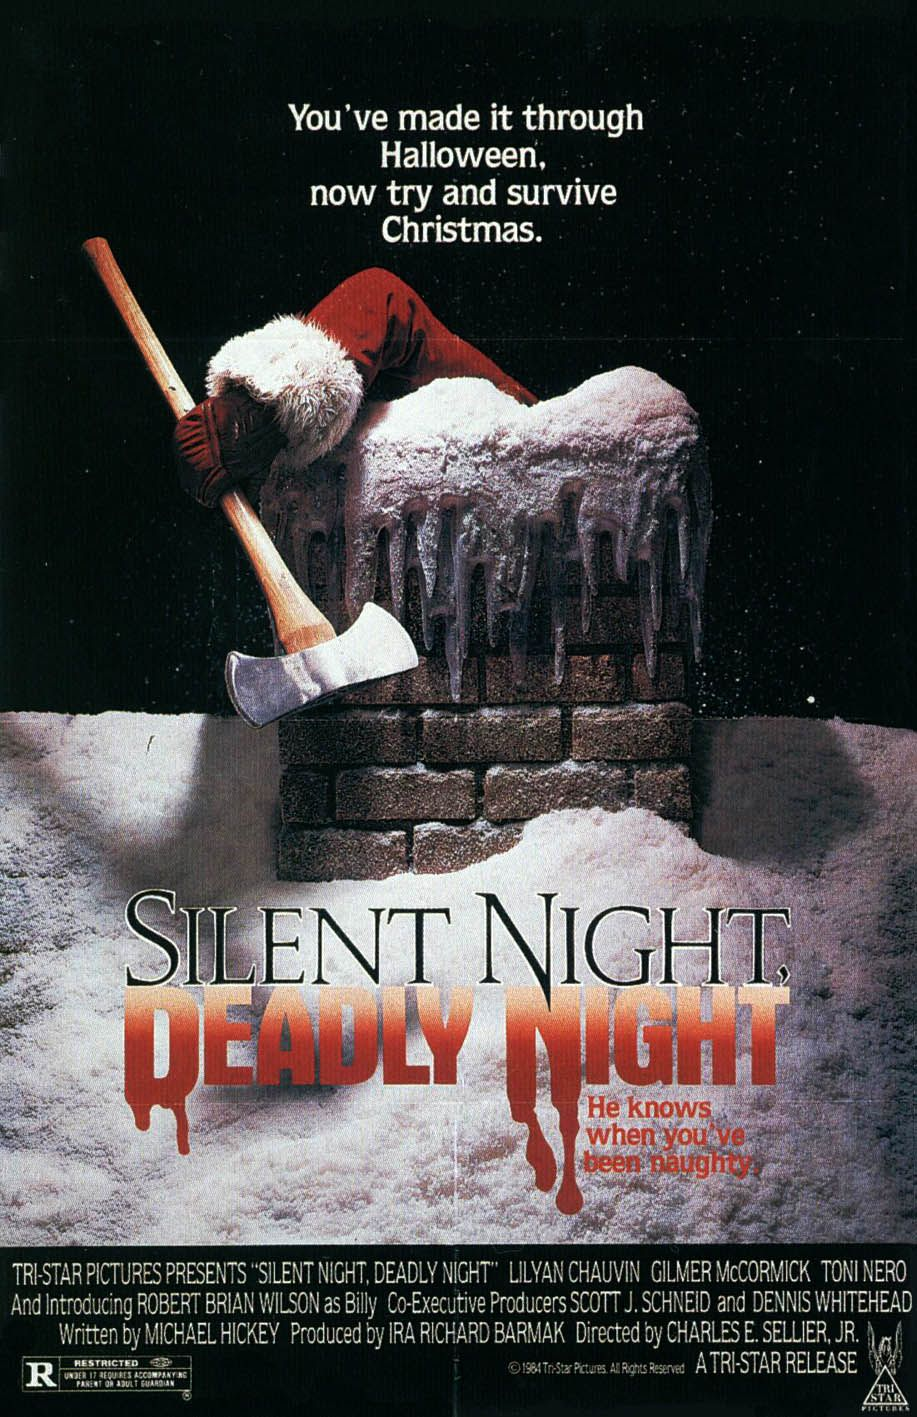 jdueso Christmas horror, Silent night, Horror movie posters